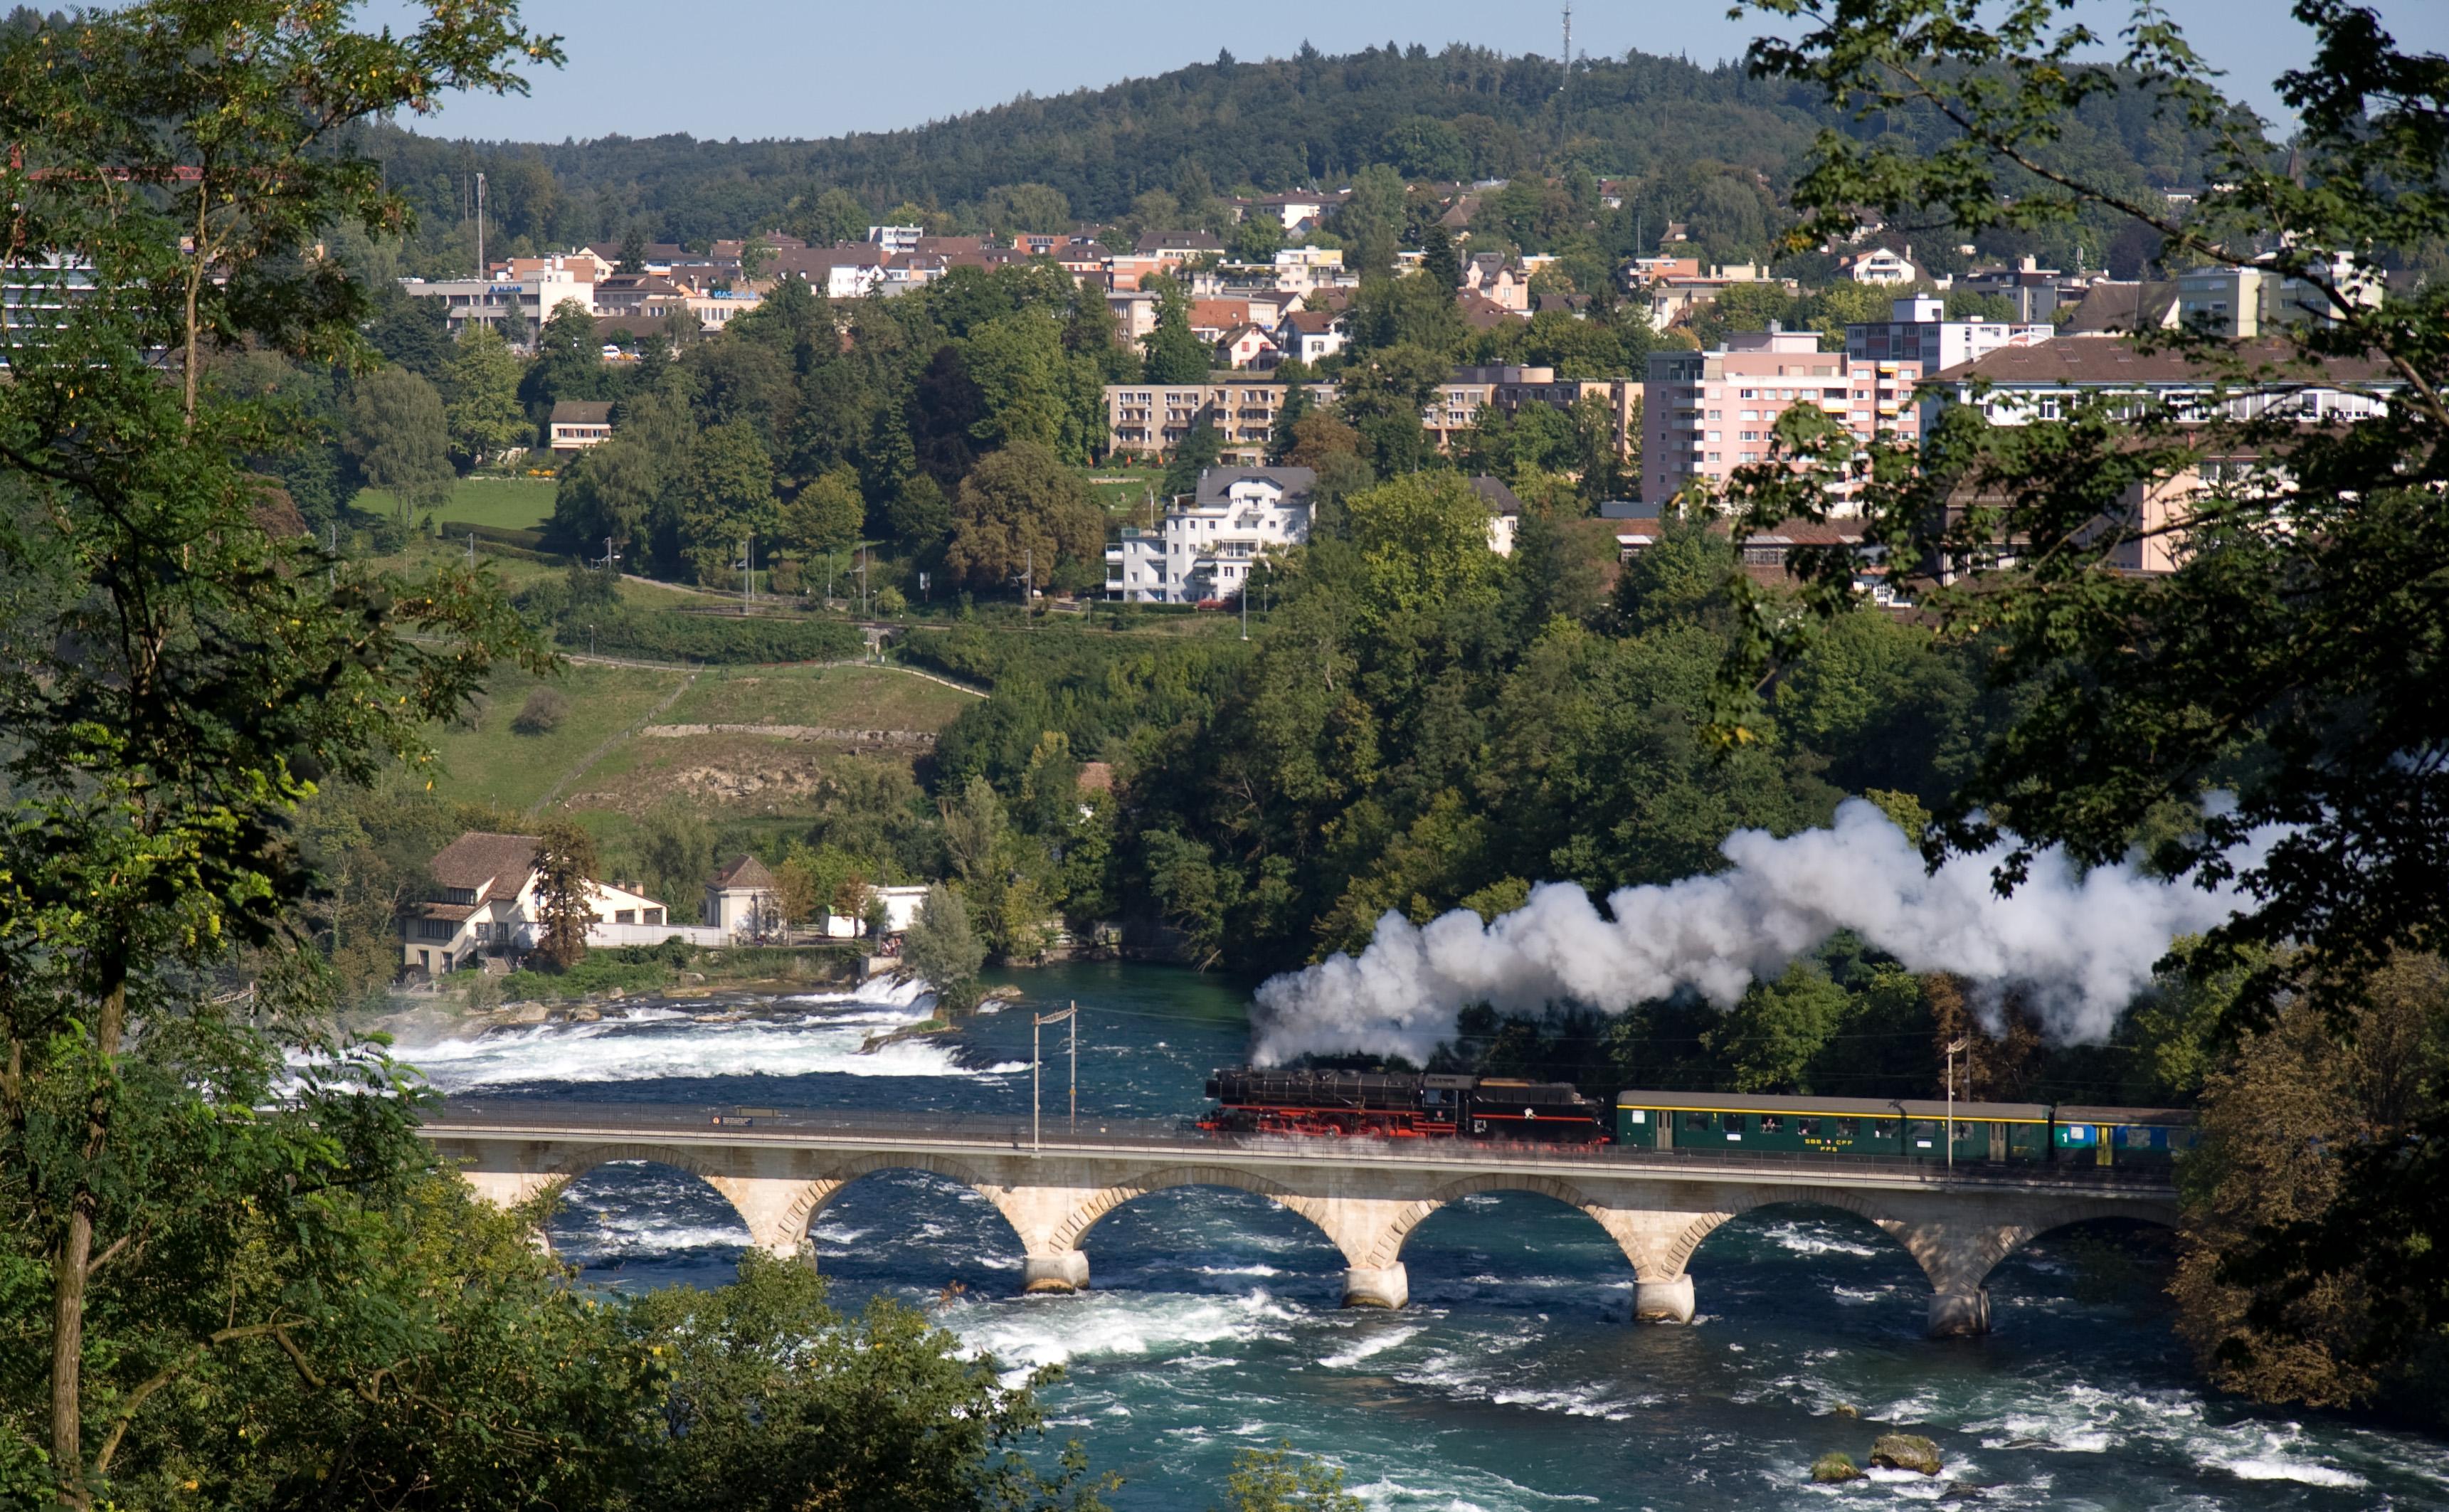 File:Dampflokomotive beim Rheinfall, Neuhausen.jpg - Wikimedia Commons